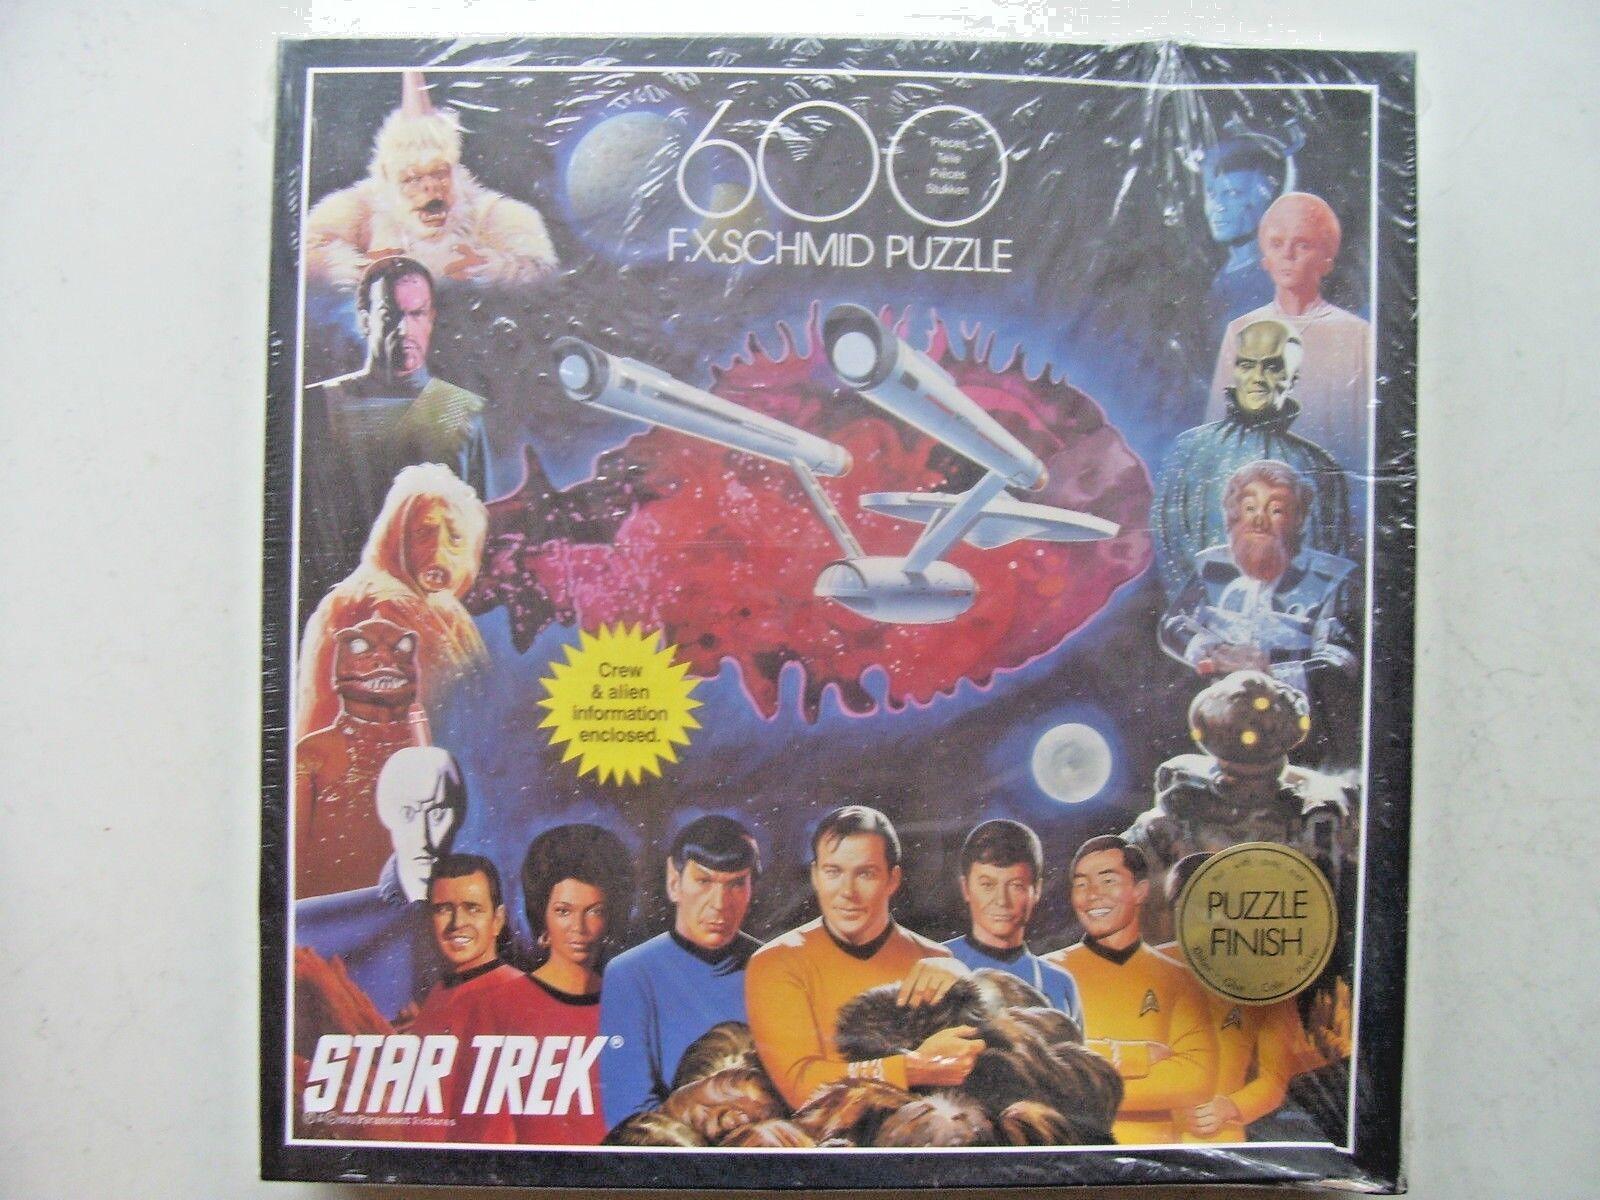 Star Trek 600 Piece Jigsaw By FX Schmid NEW & SEALED